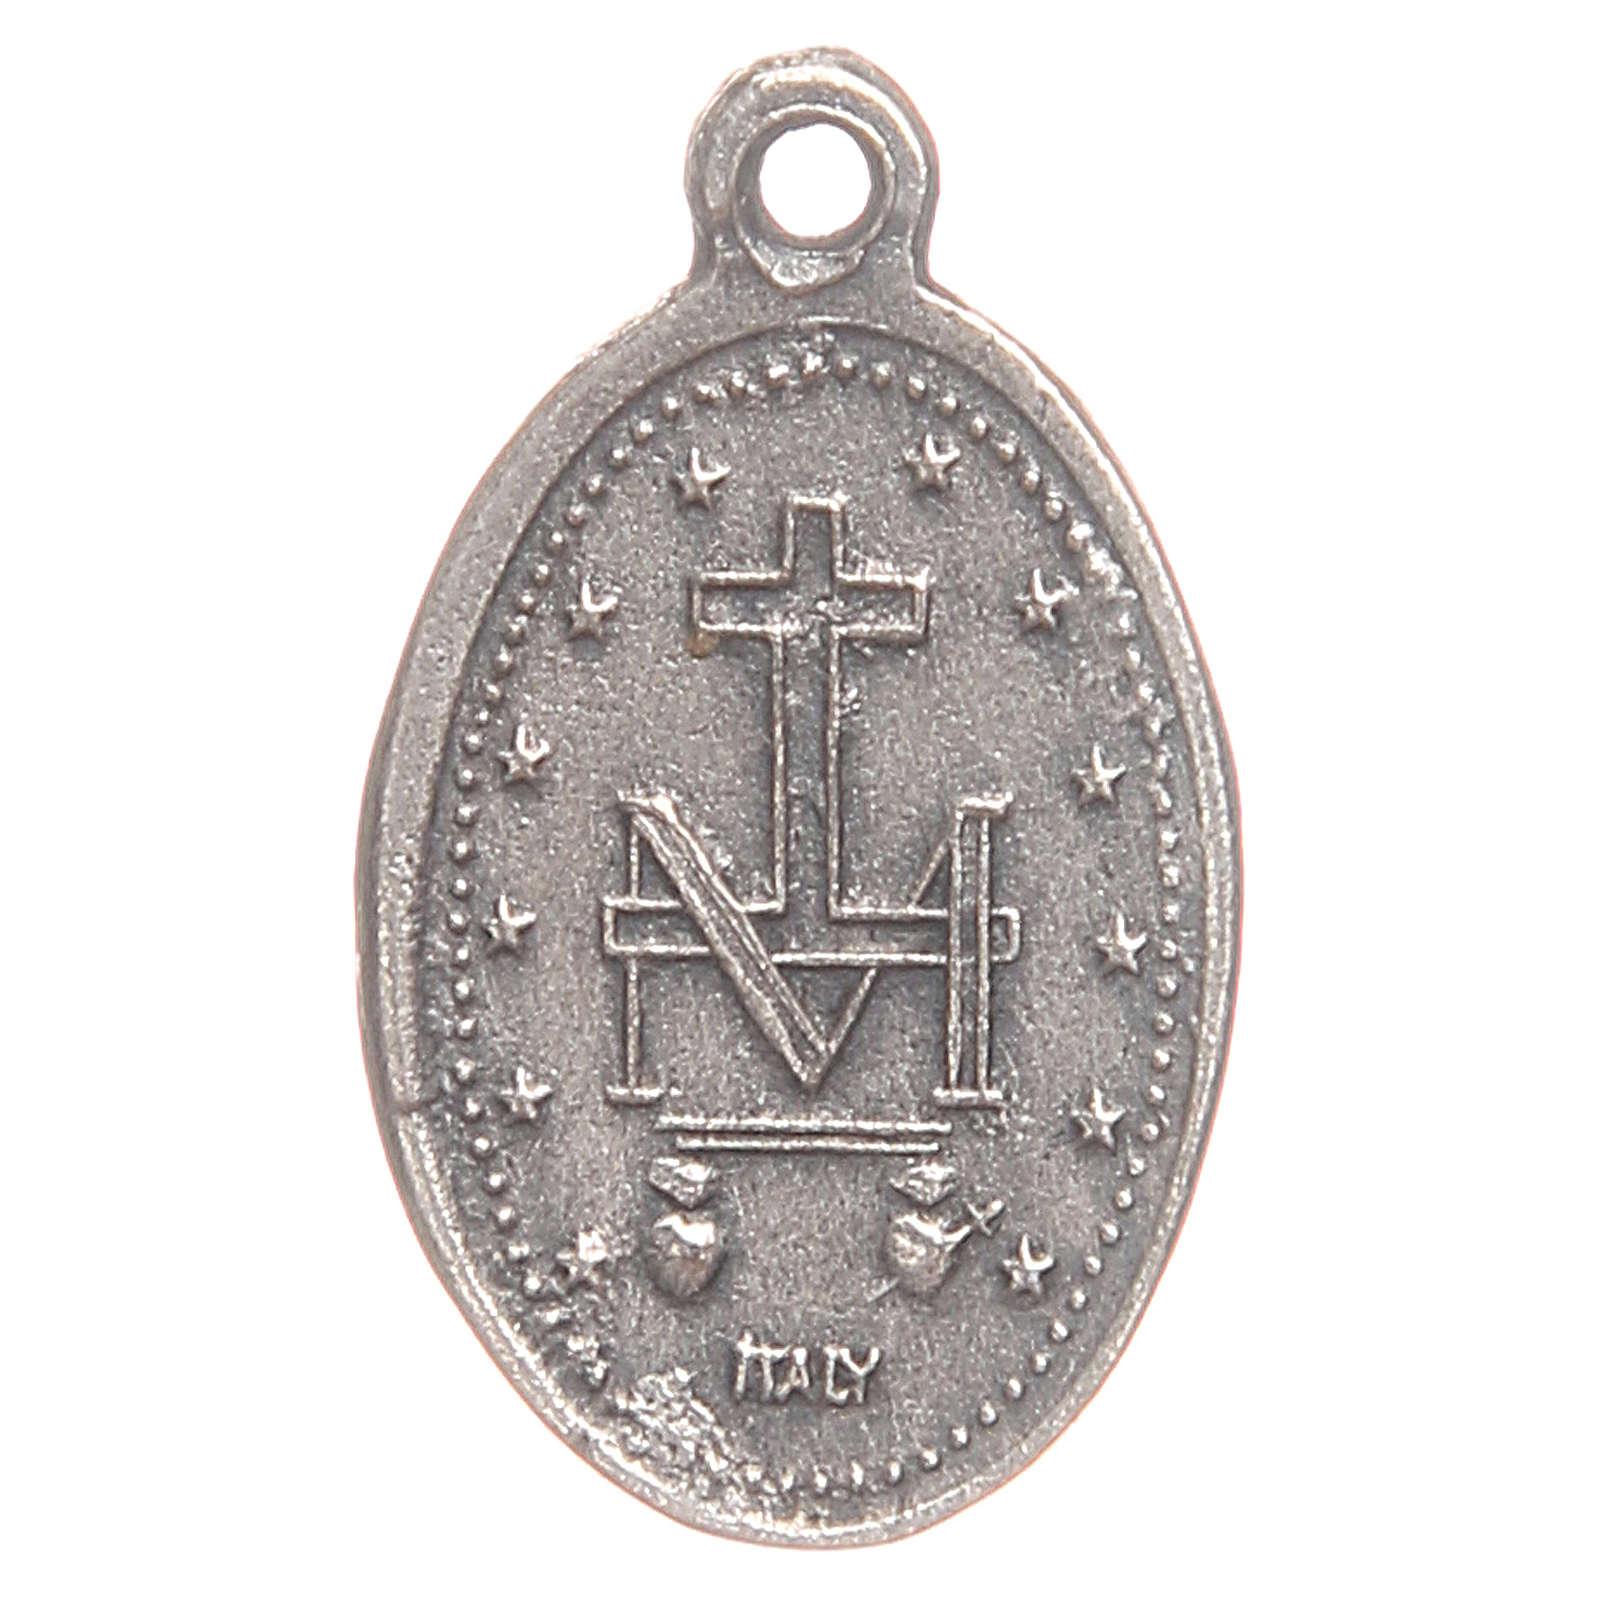 Miraculous Medal measuring 1.9cm 4